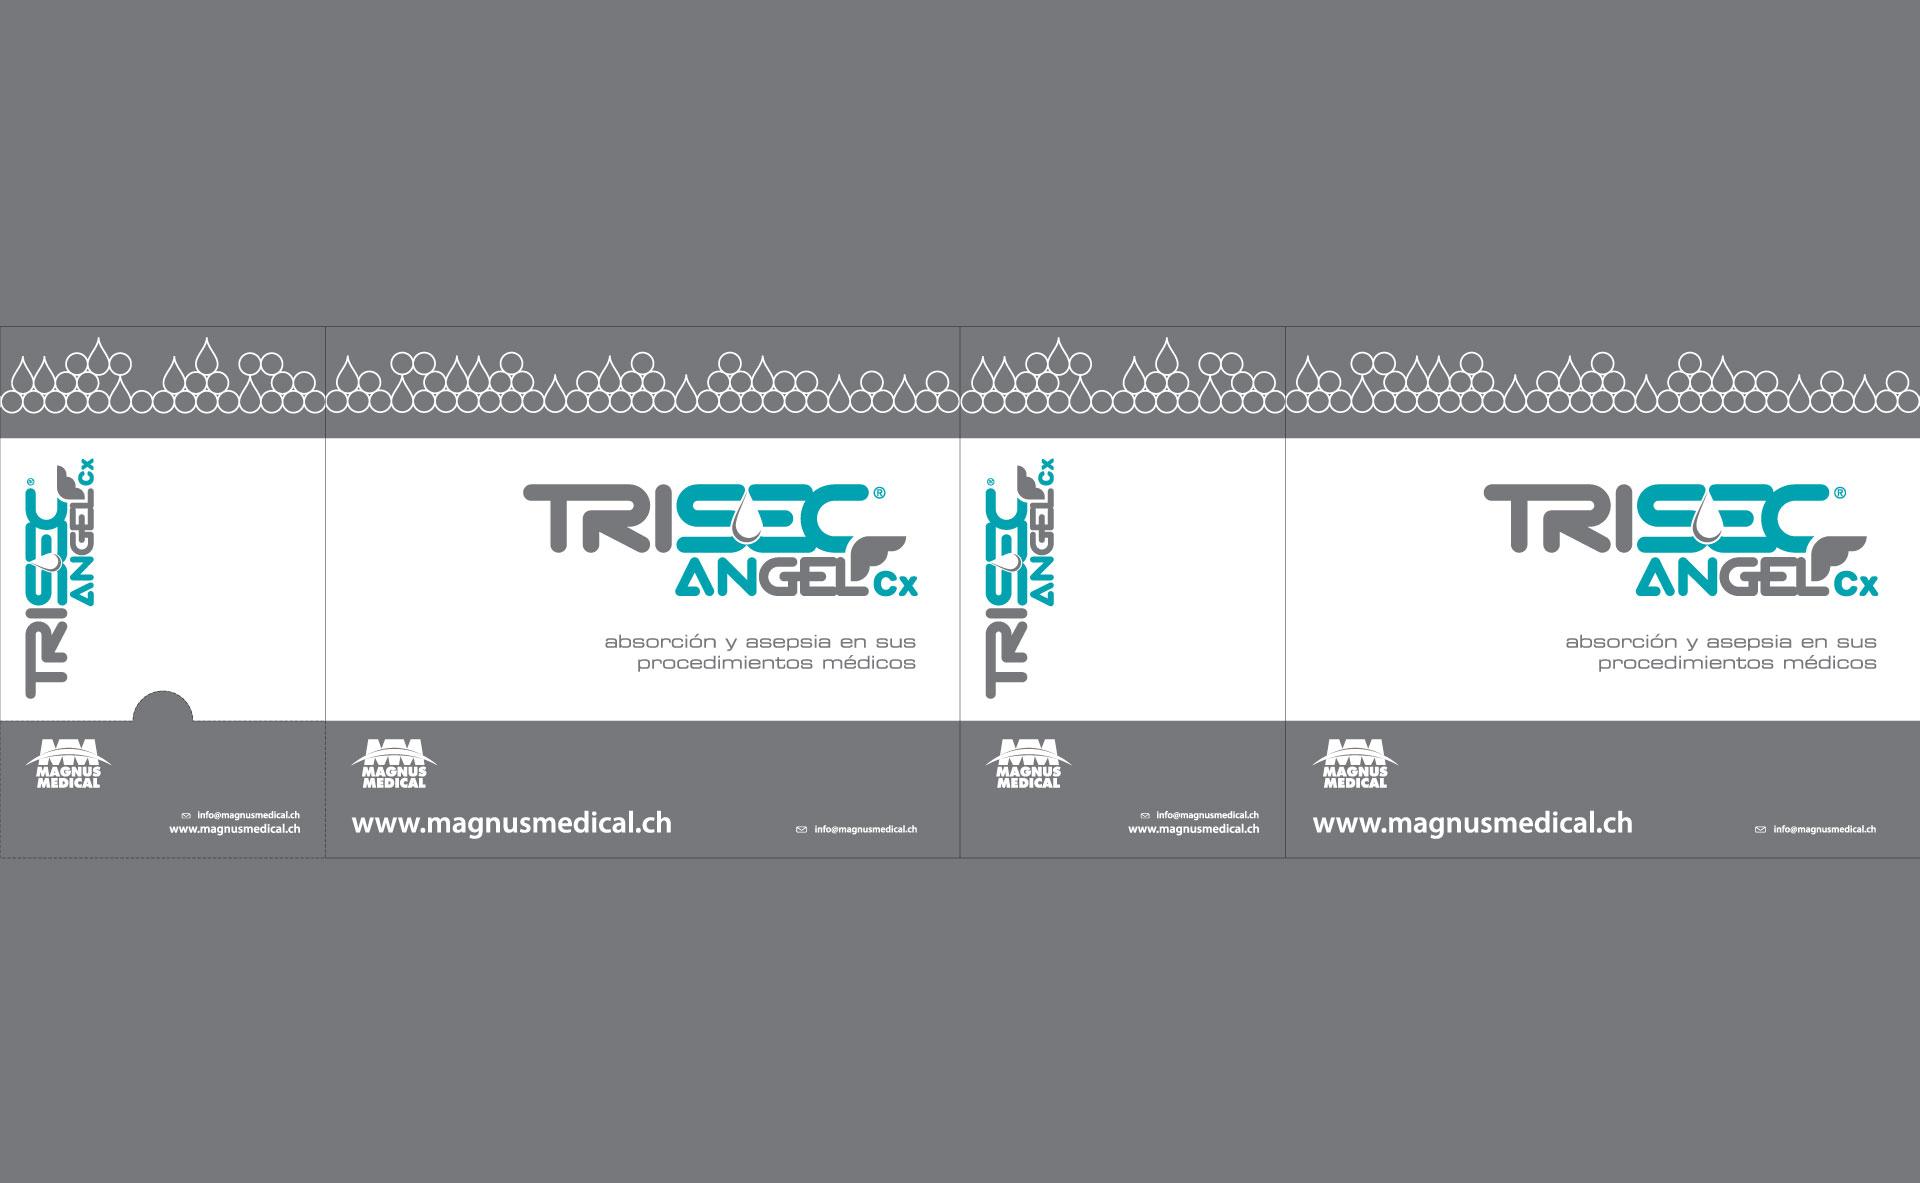 Diseño de Empaque Trisec Angel Cx